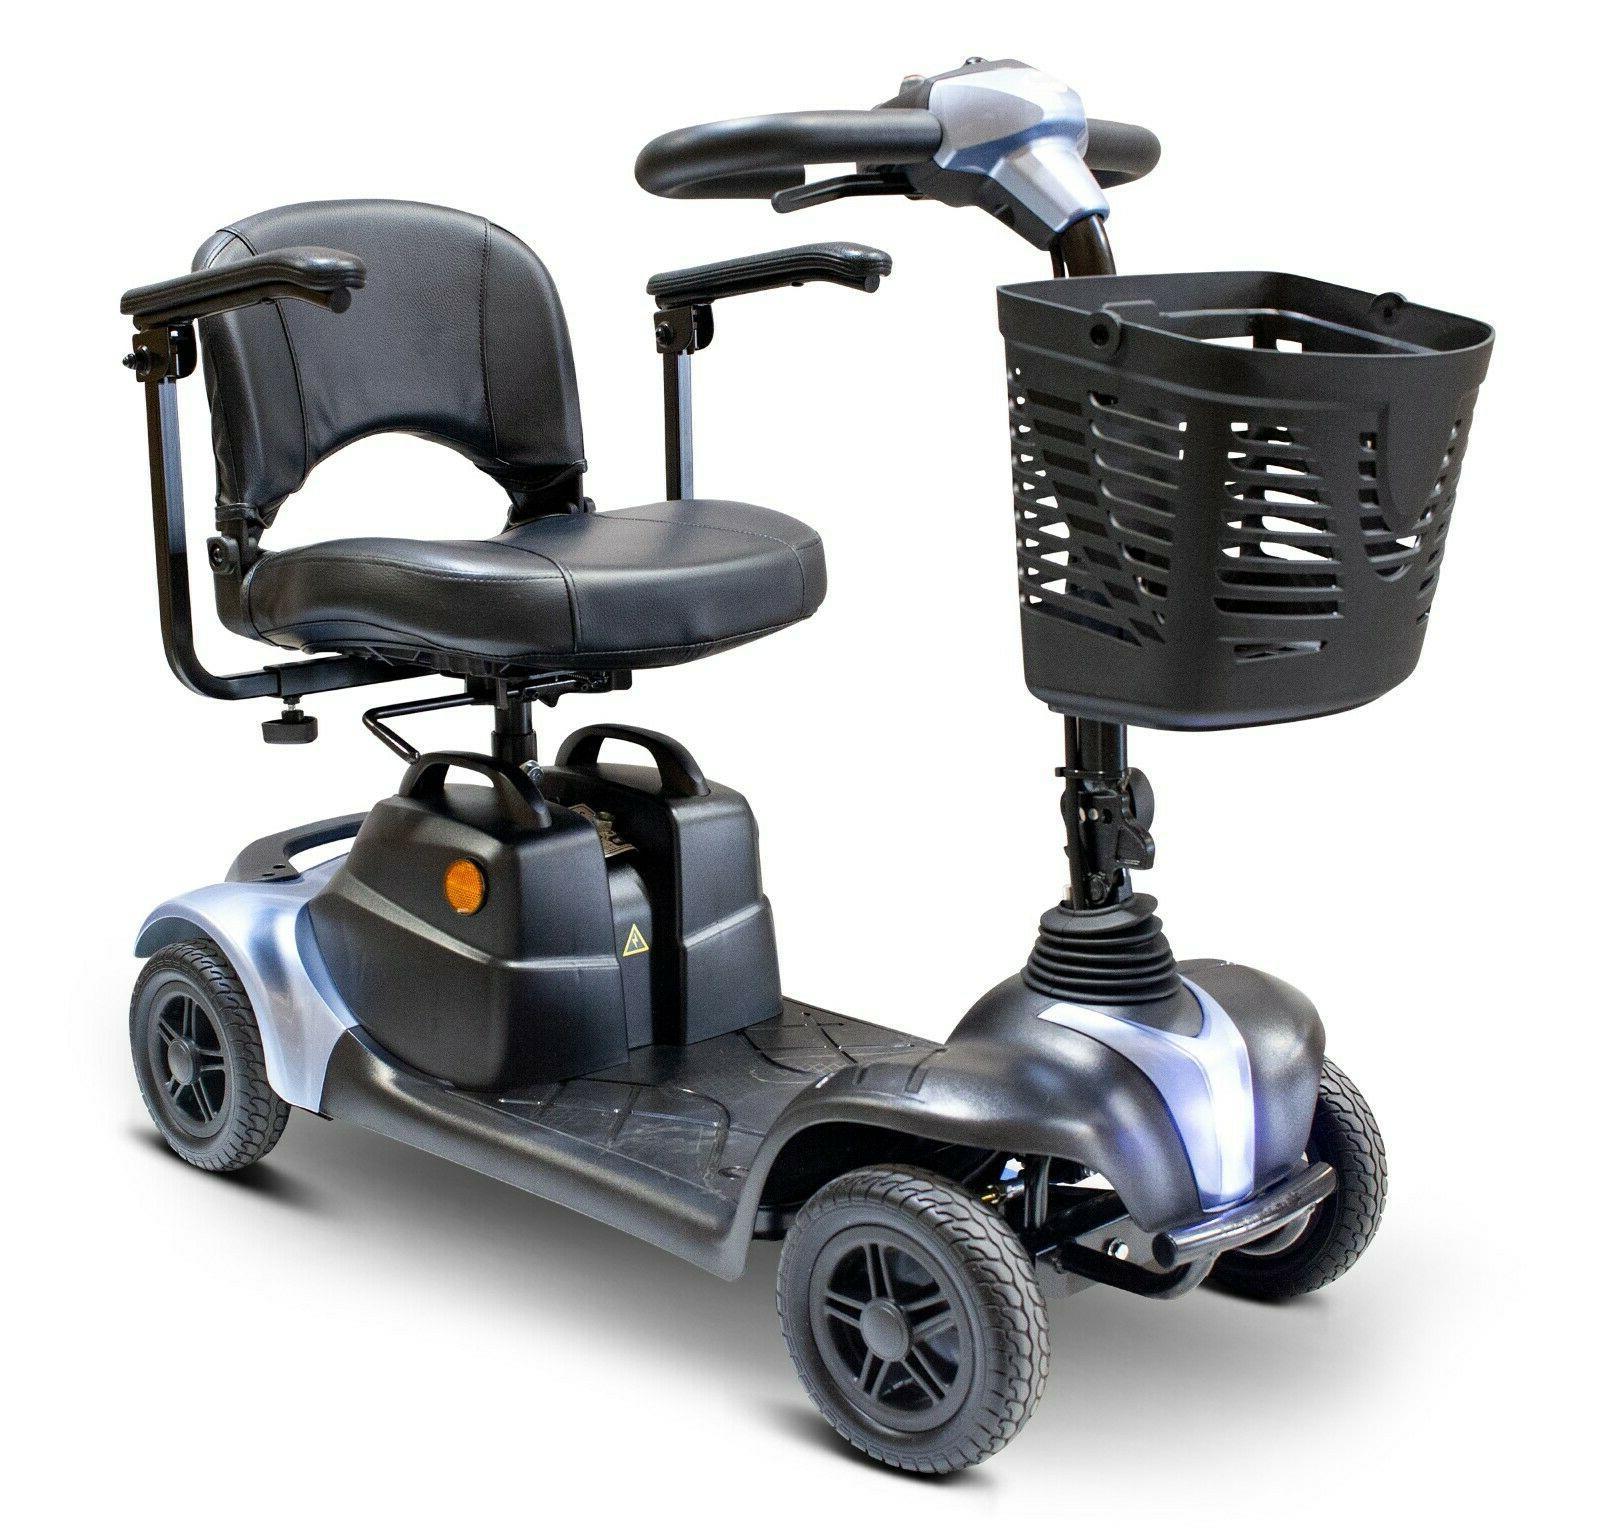 Blue EWheels Scooter, 15